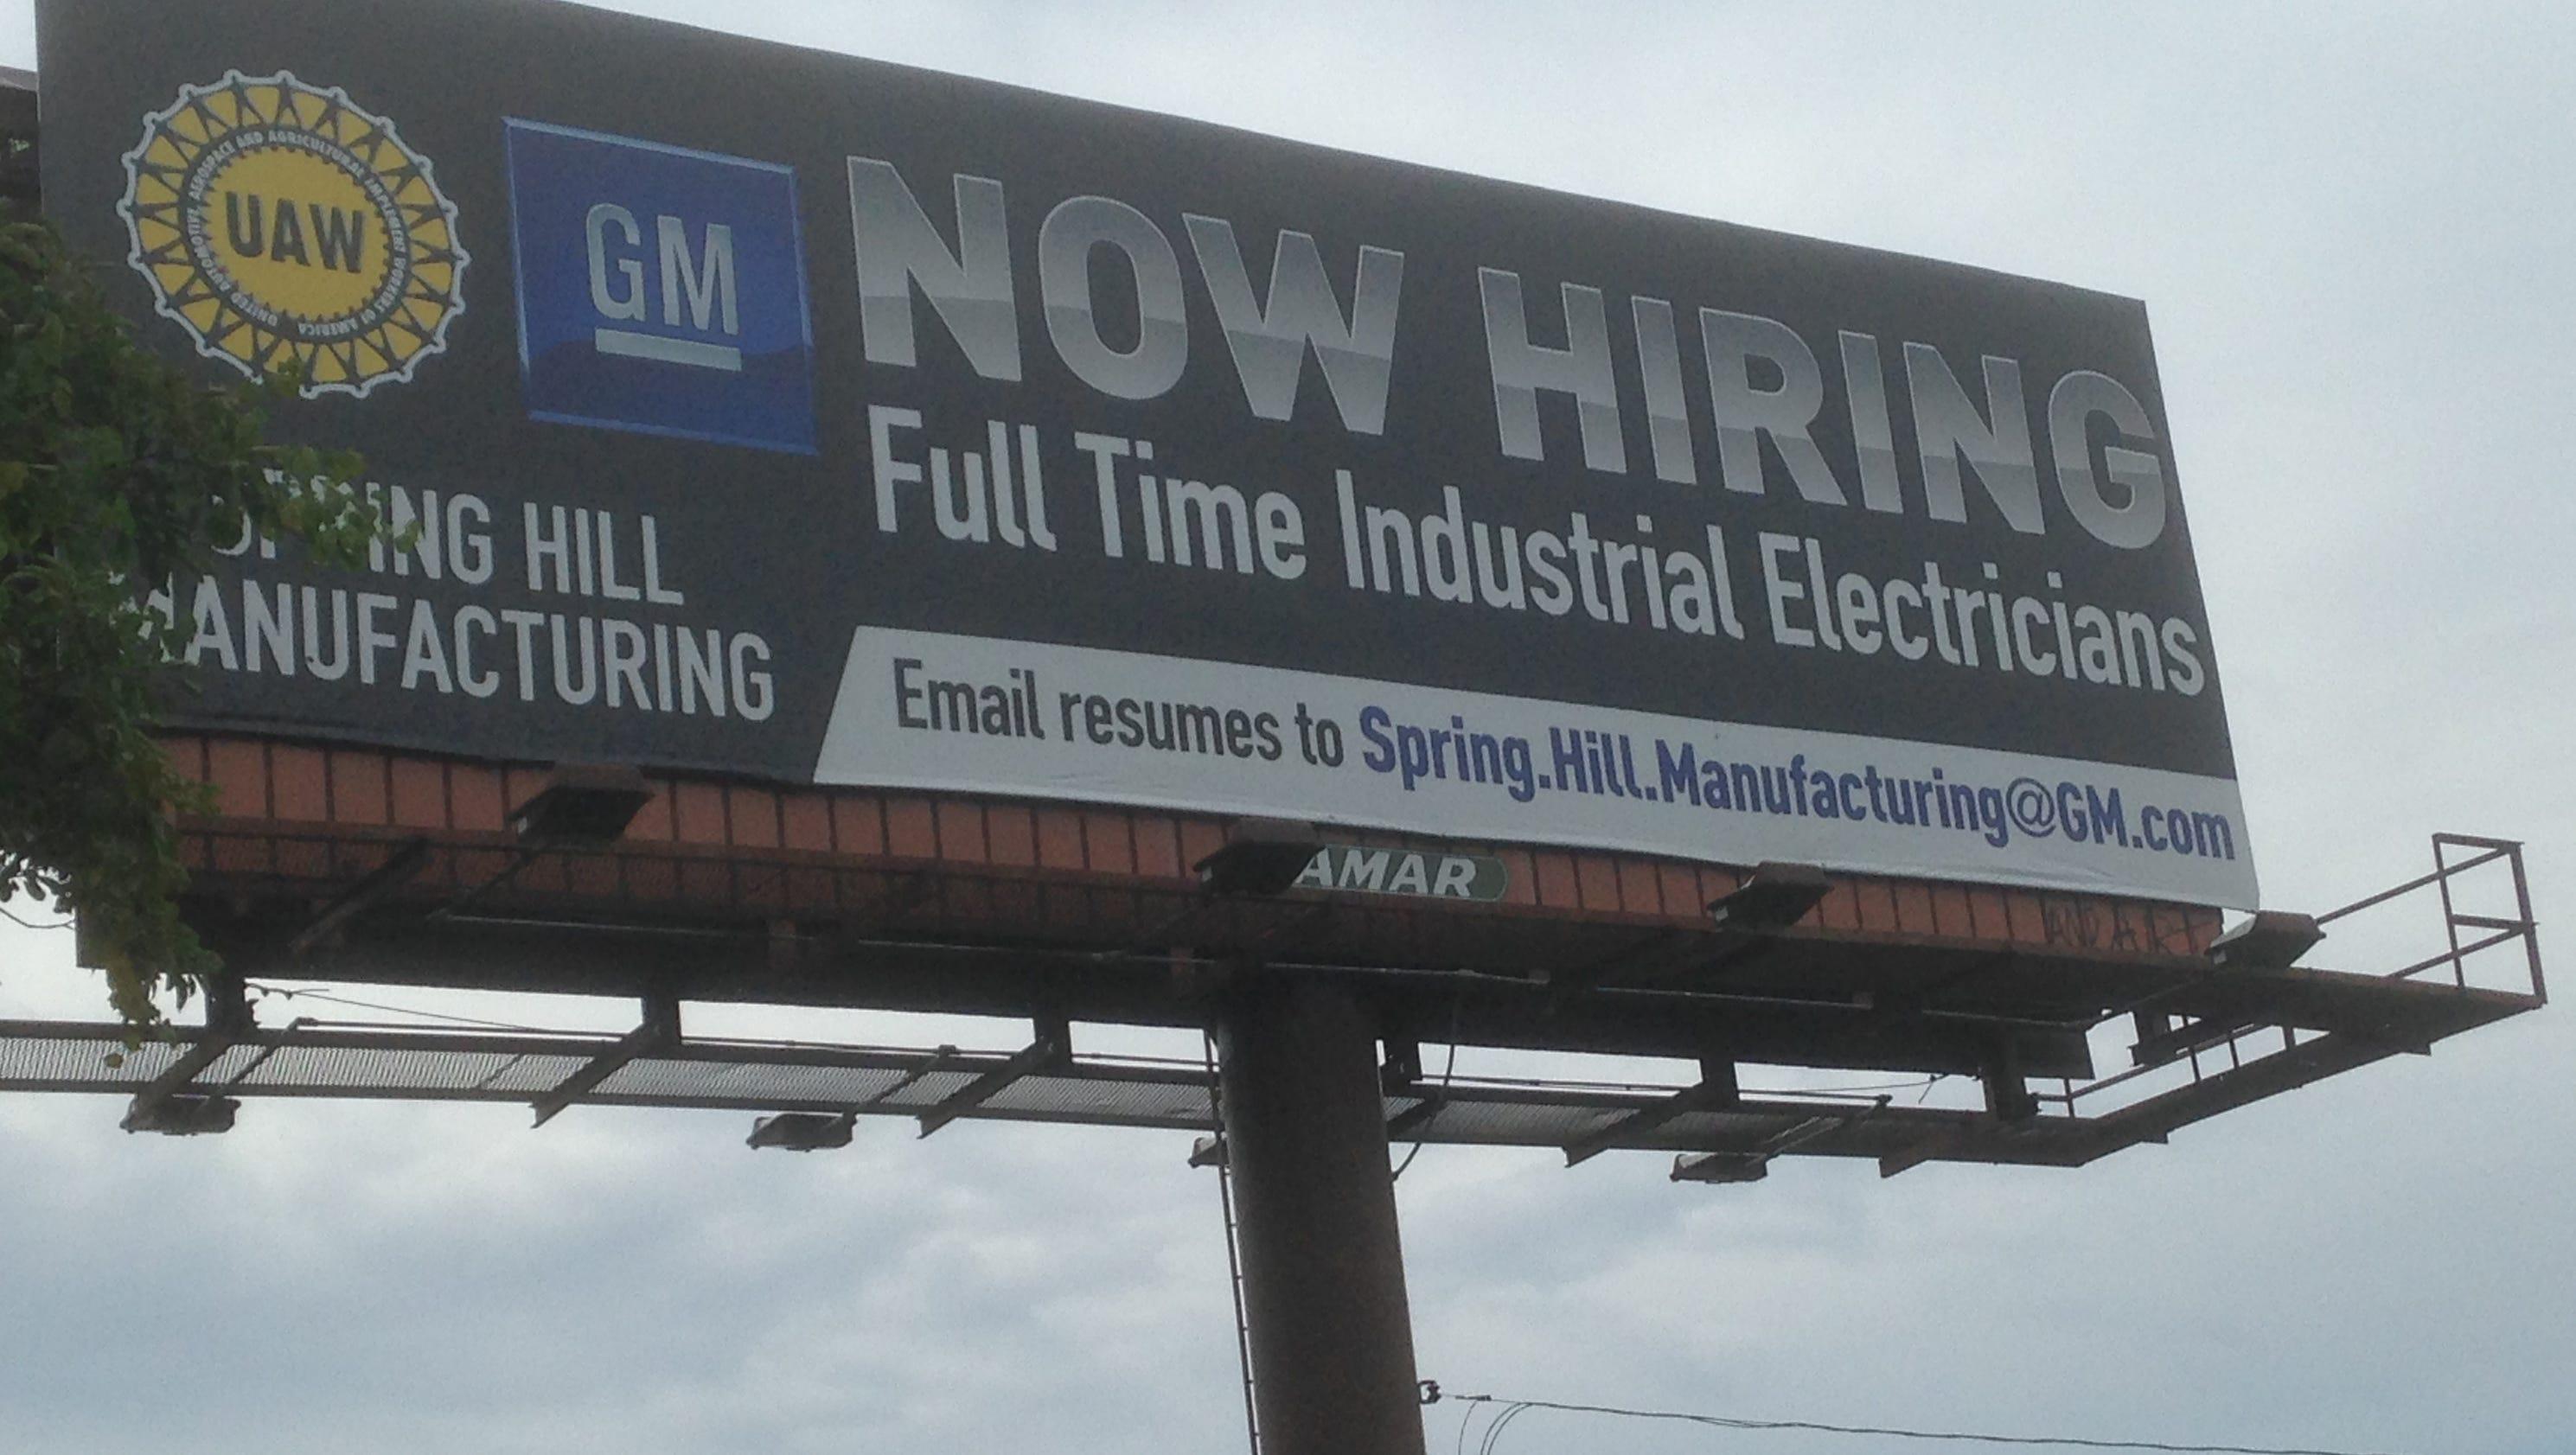 Gm Uaw Erect Billboard Near Nissan Factory